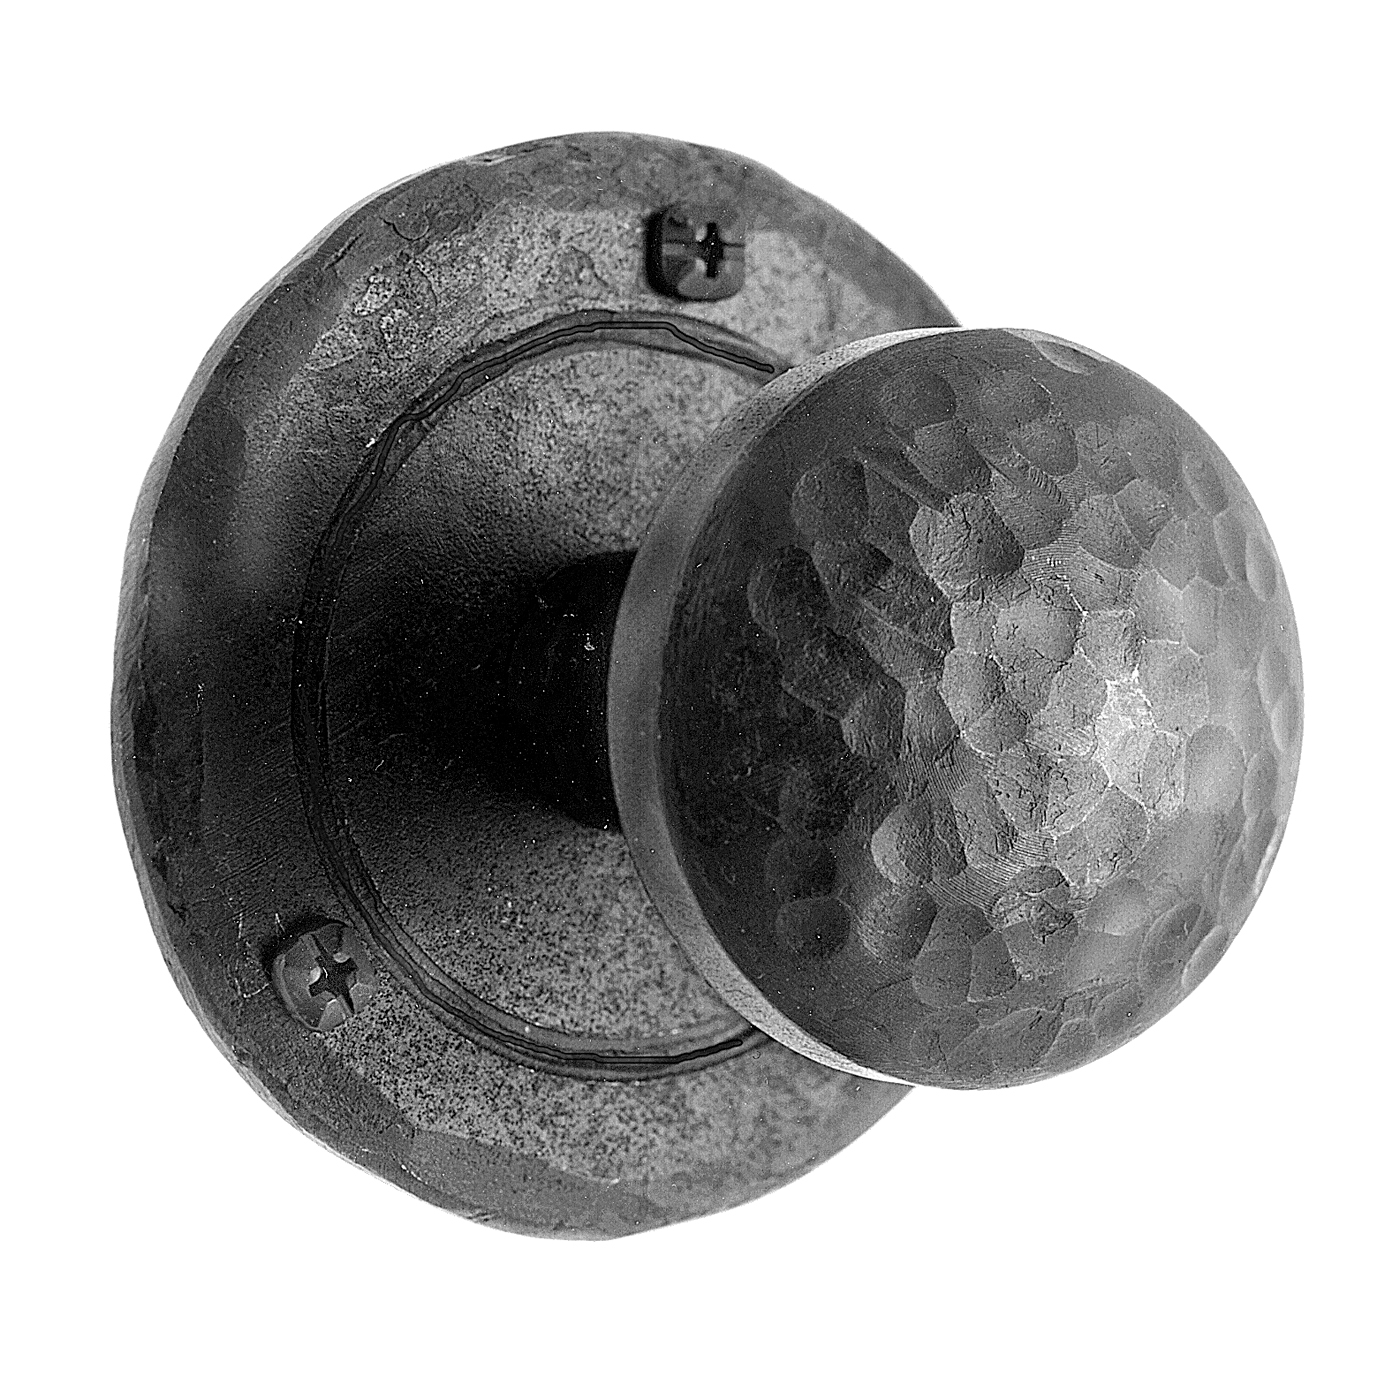 black iron door knobs photo - 1